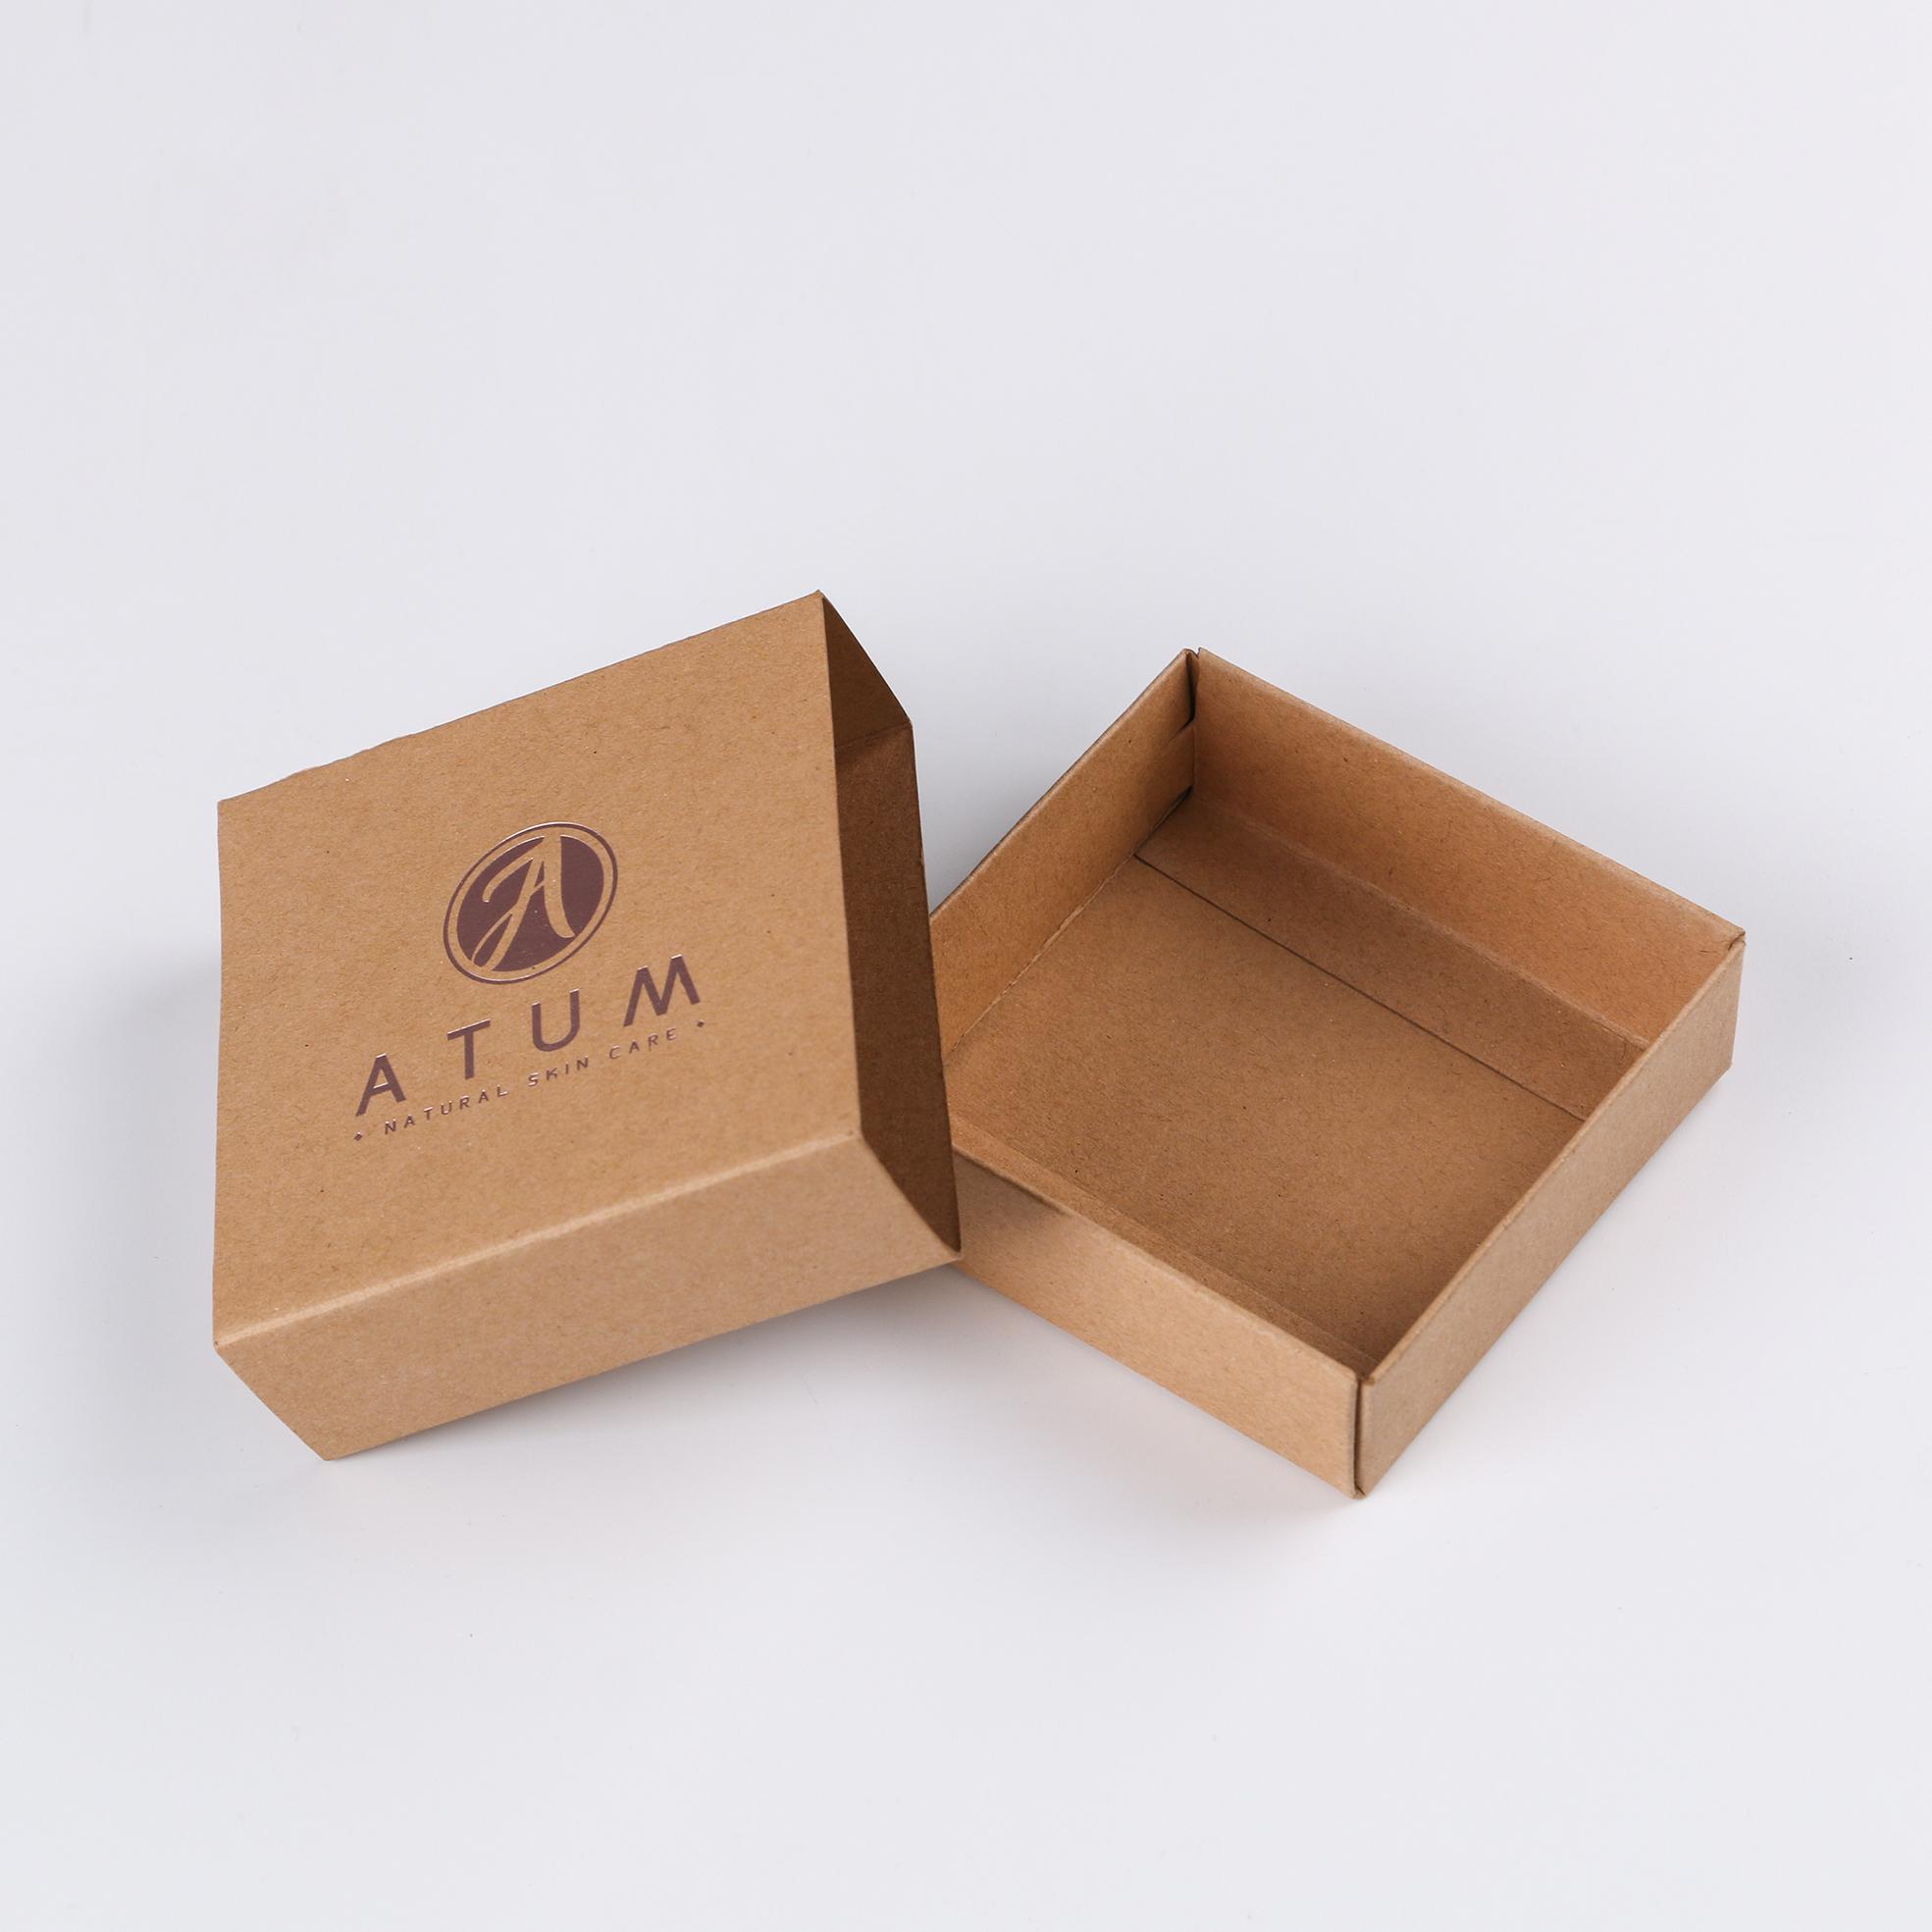 Design Simple Recycled Brown Kraft Luxury Carton Soap Box Packaging Buy Soap Carton Box Packagingluxury Soap Box Packagingsoap Box Packaging